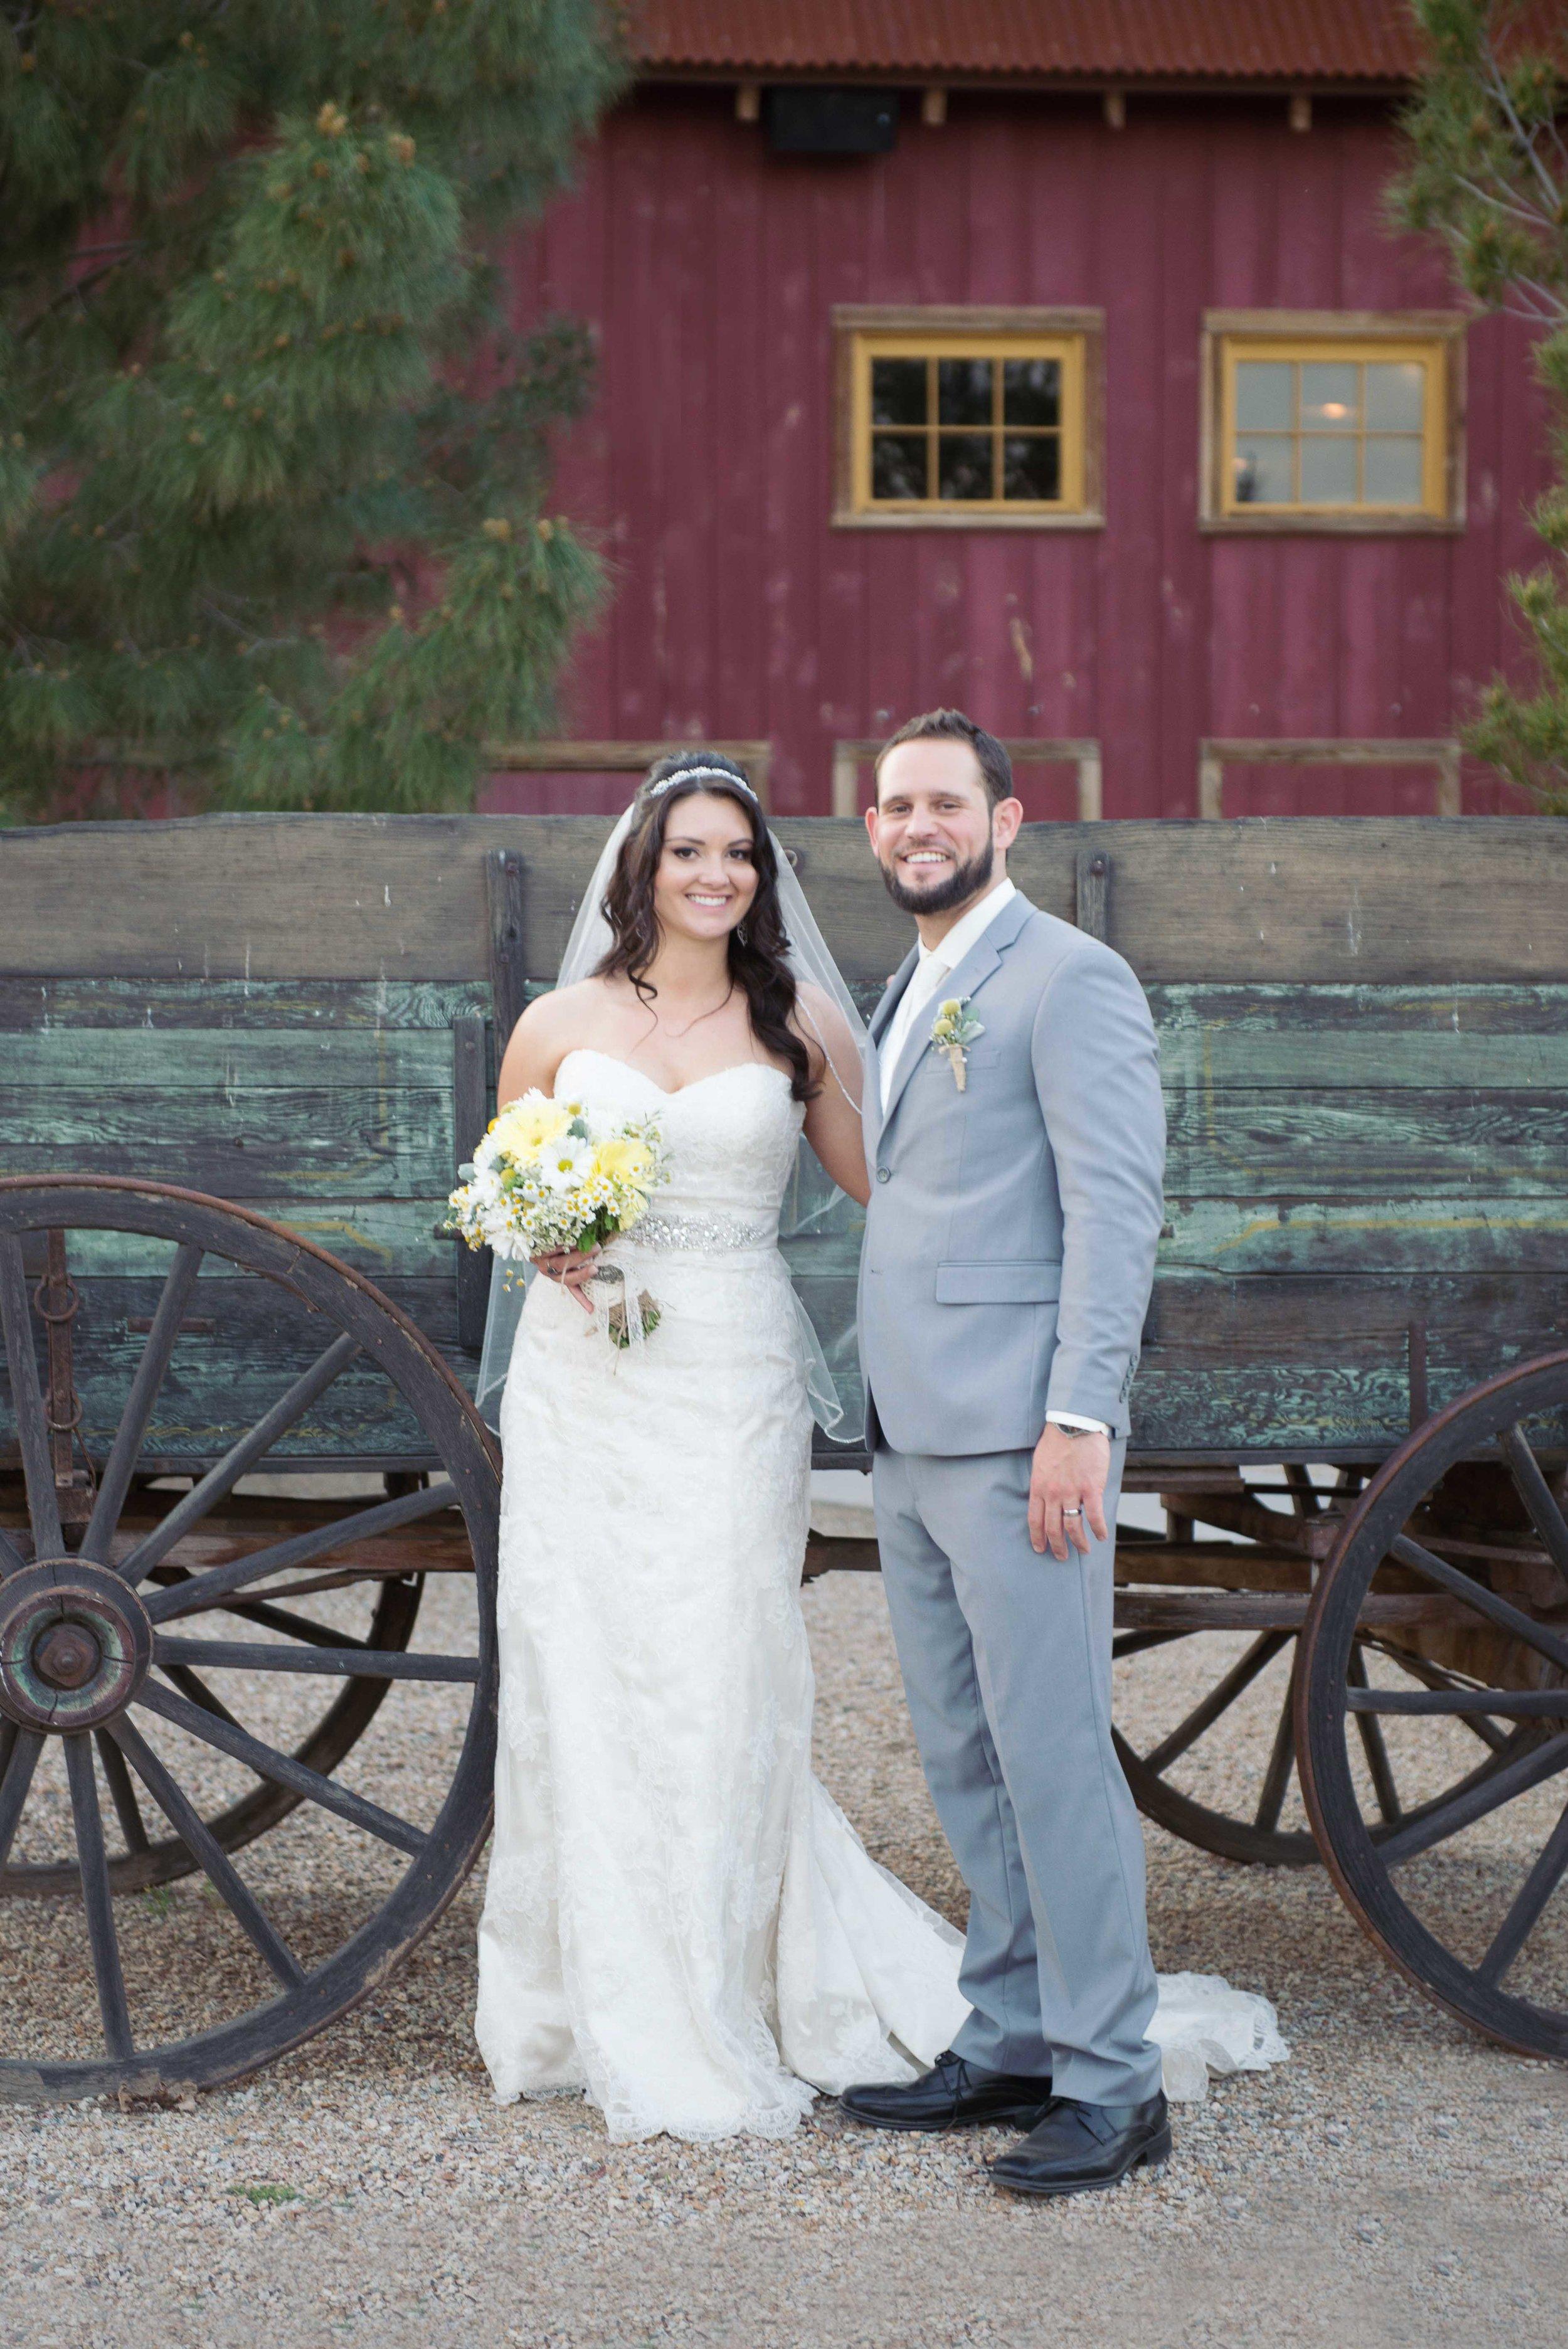 weddingwebsitesmallerpics-126.jpg